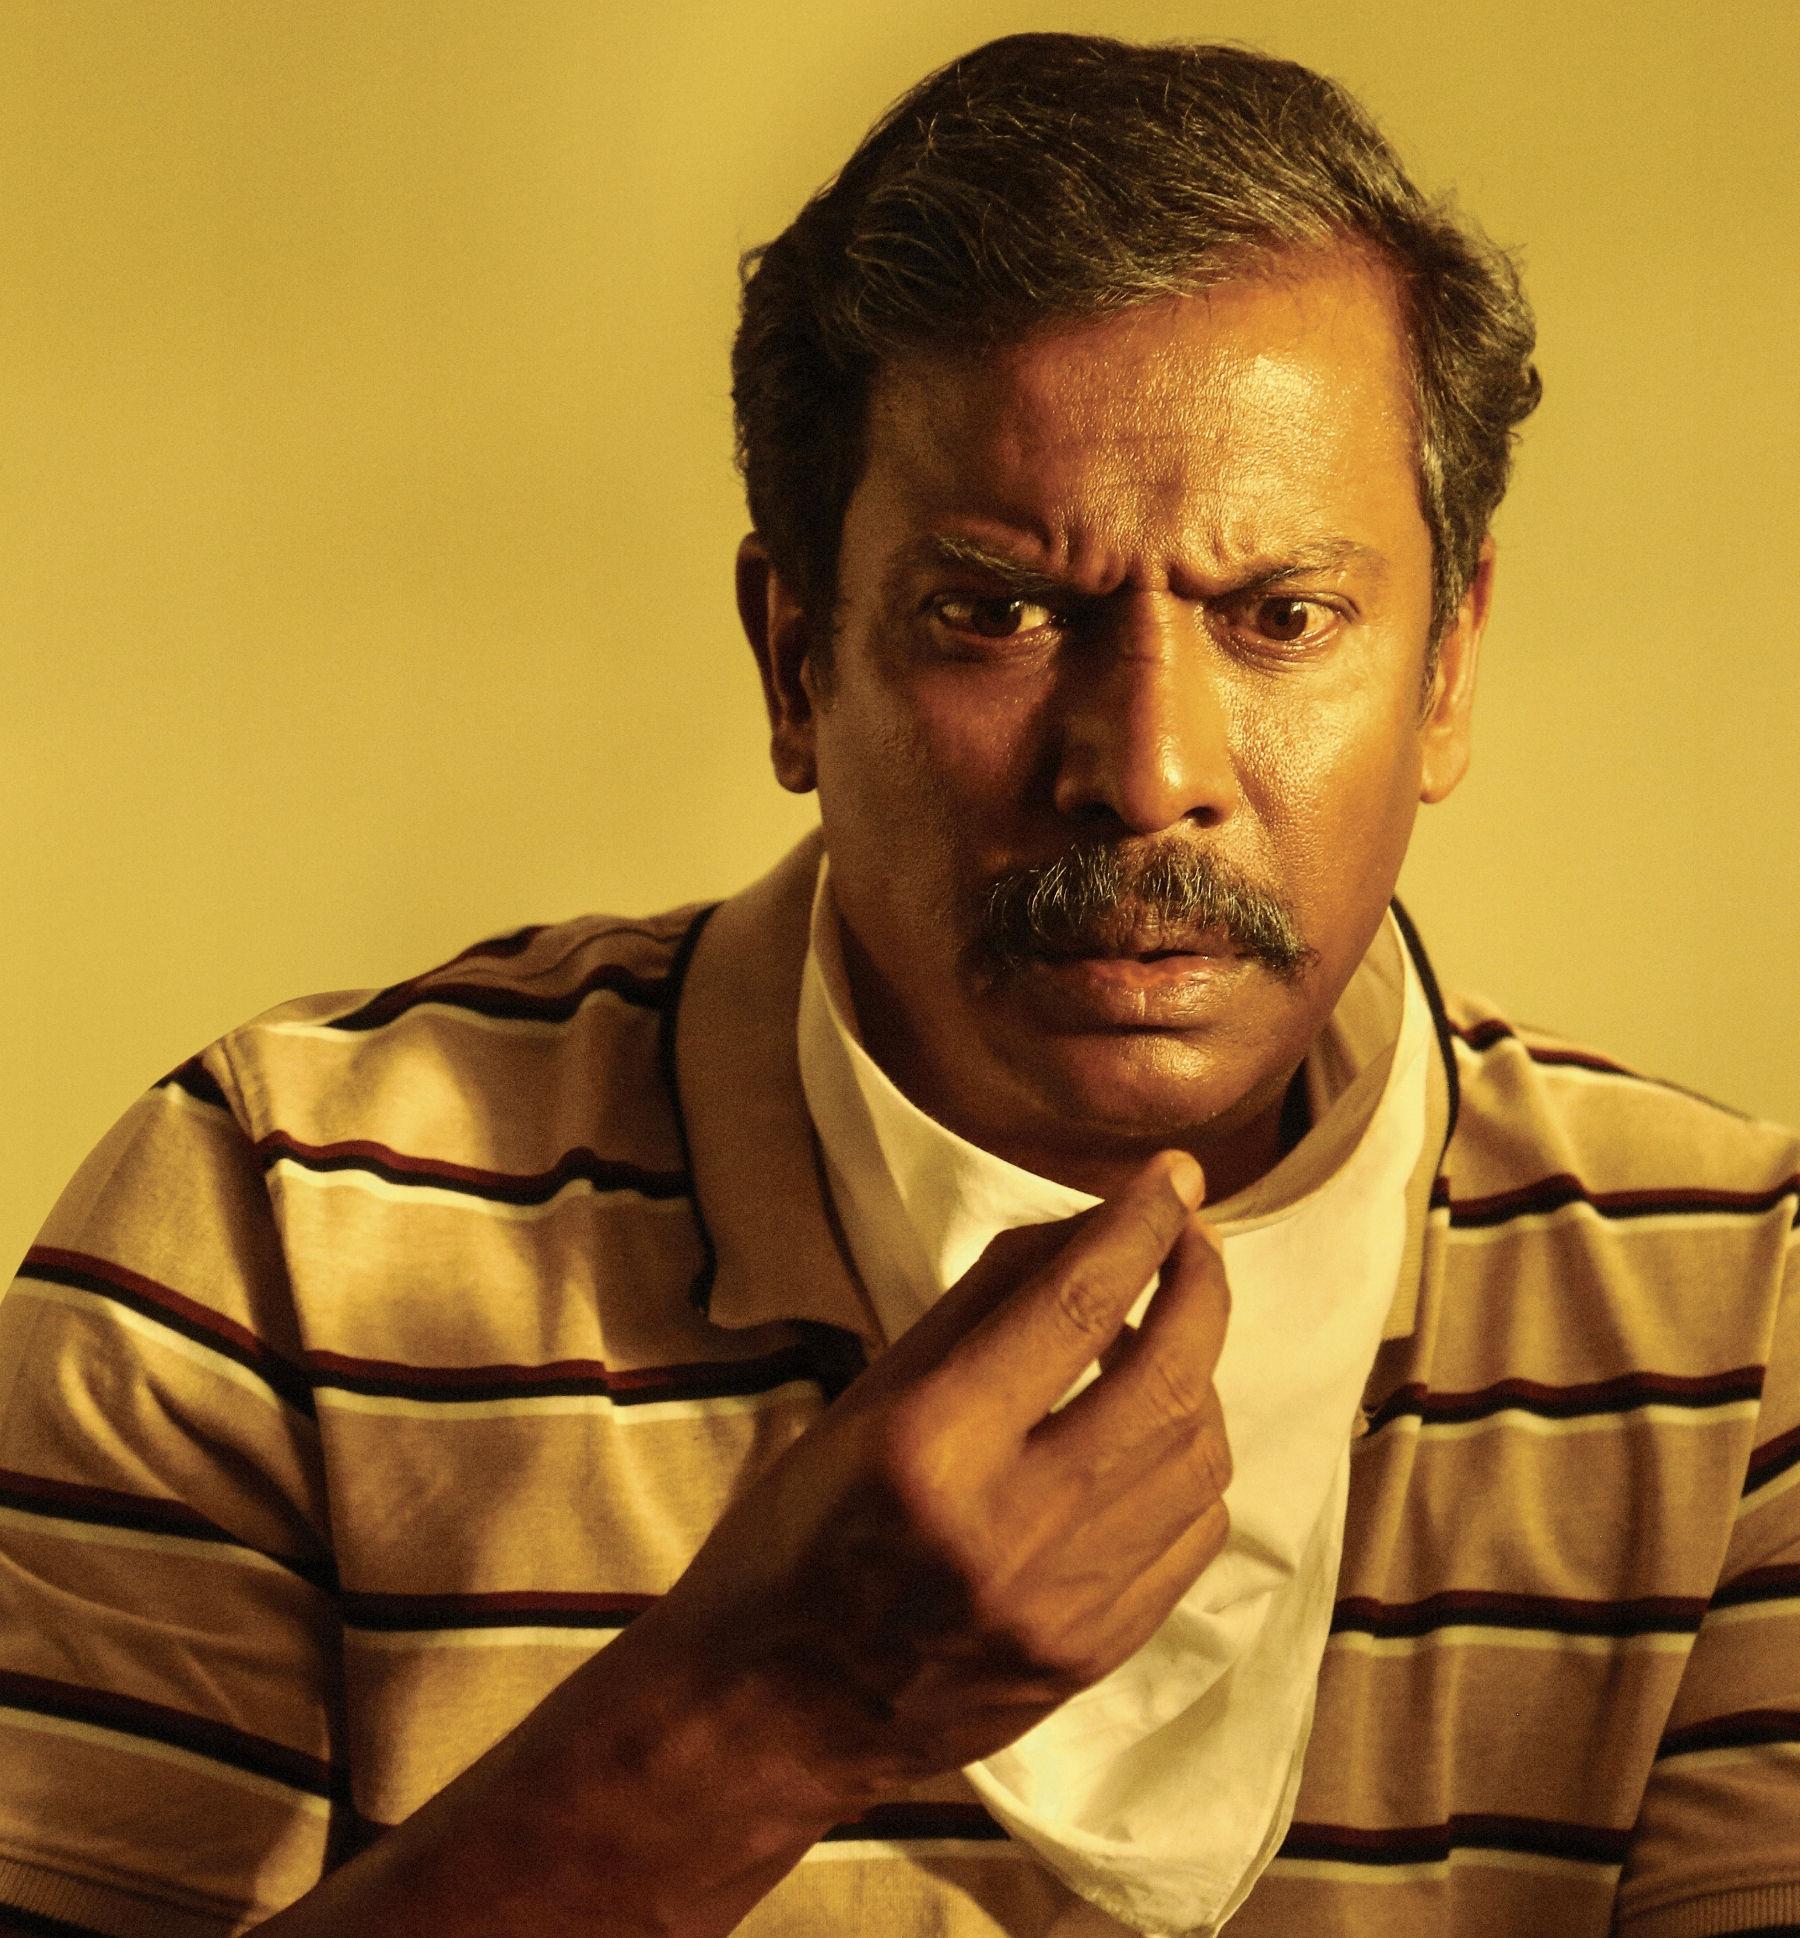 Panchathantram Samuthirakani as Ramanatham